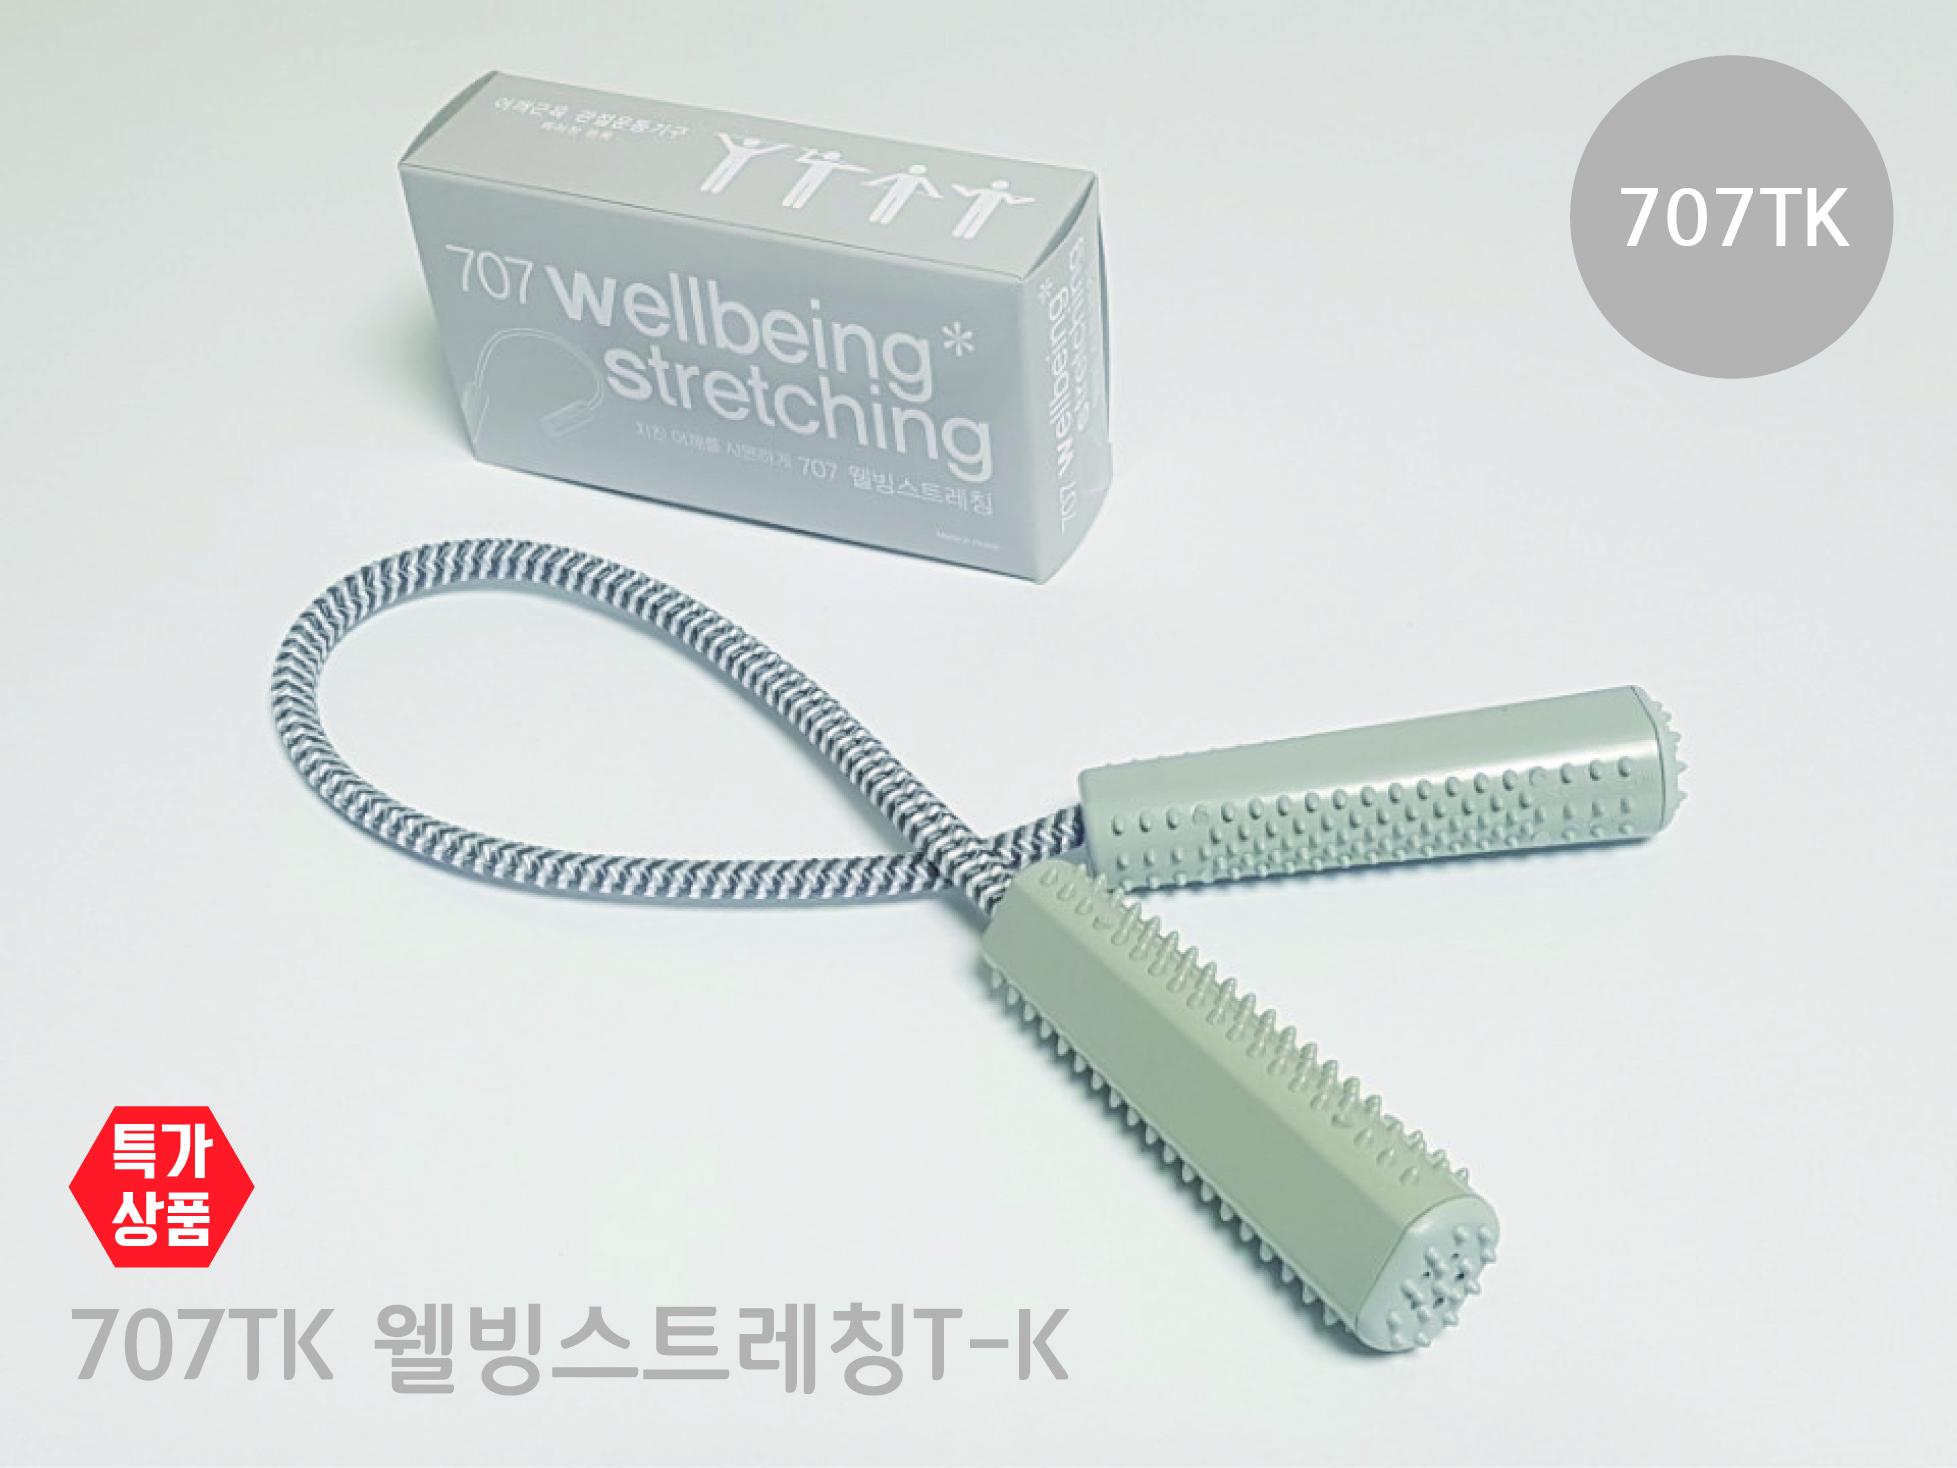 WB-707TK 웰빙스트레칭